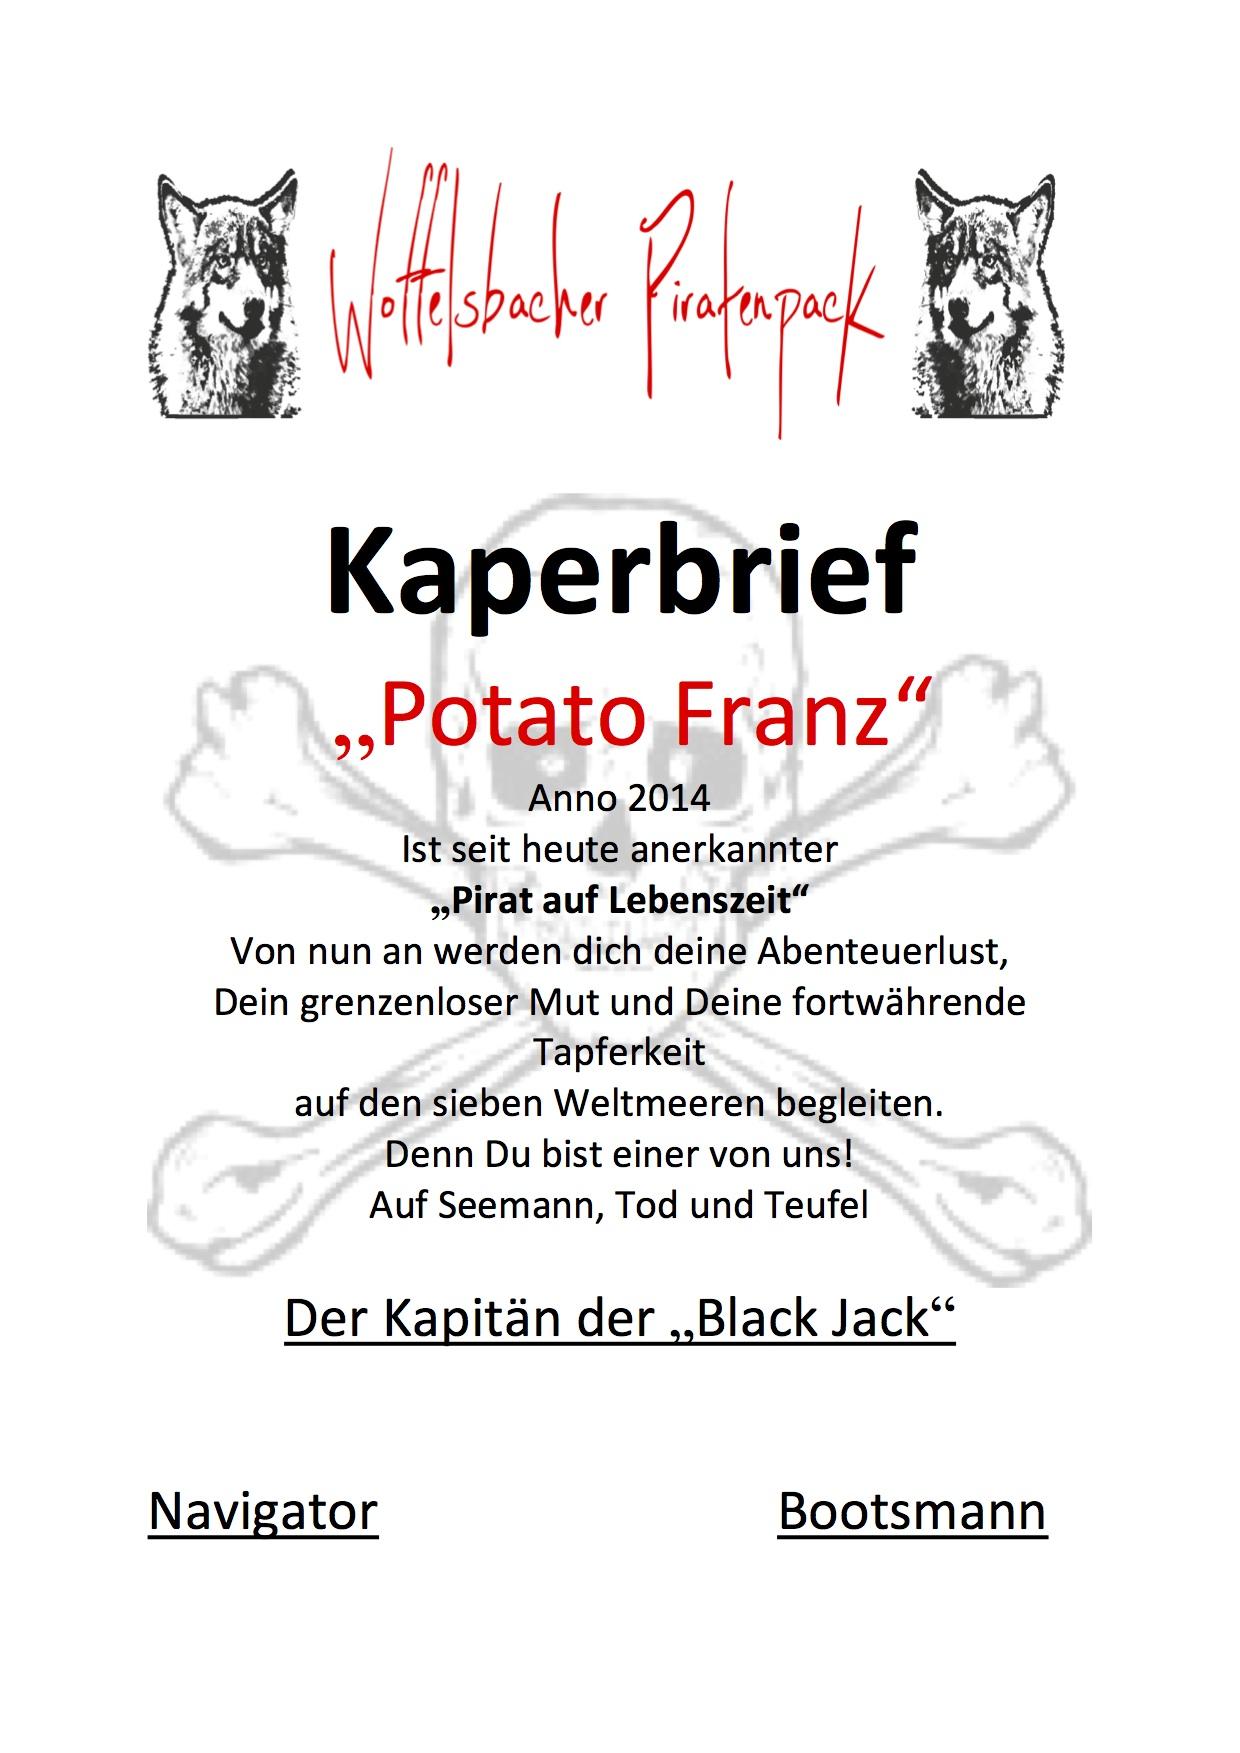 2014_07_22 Urkunde Potato Franz